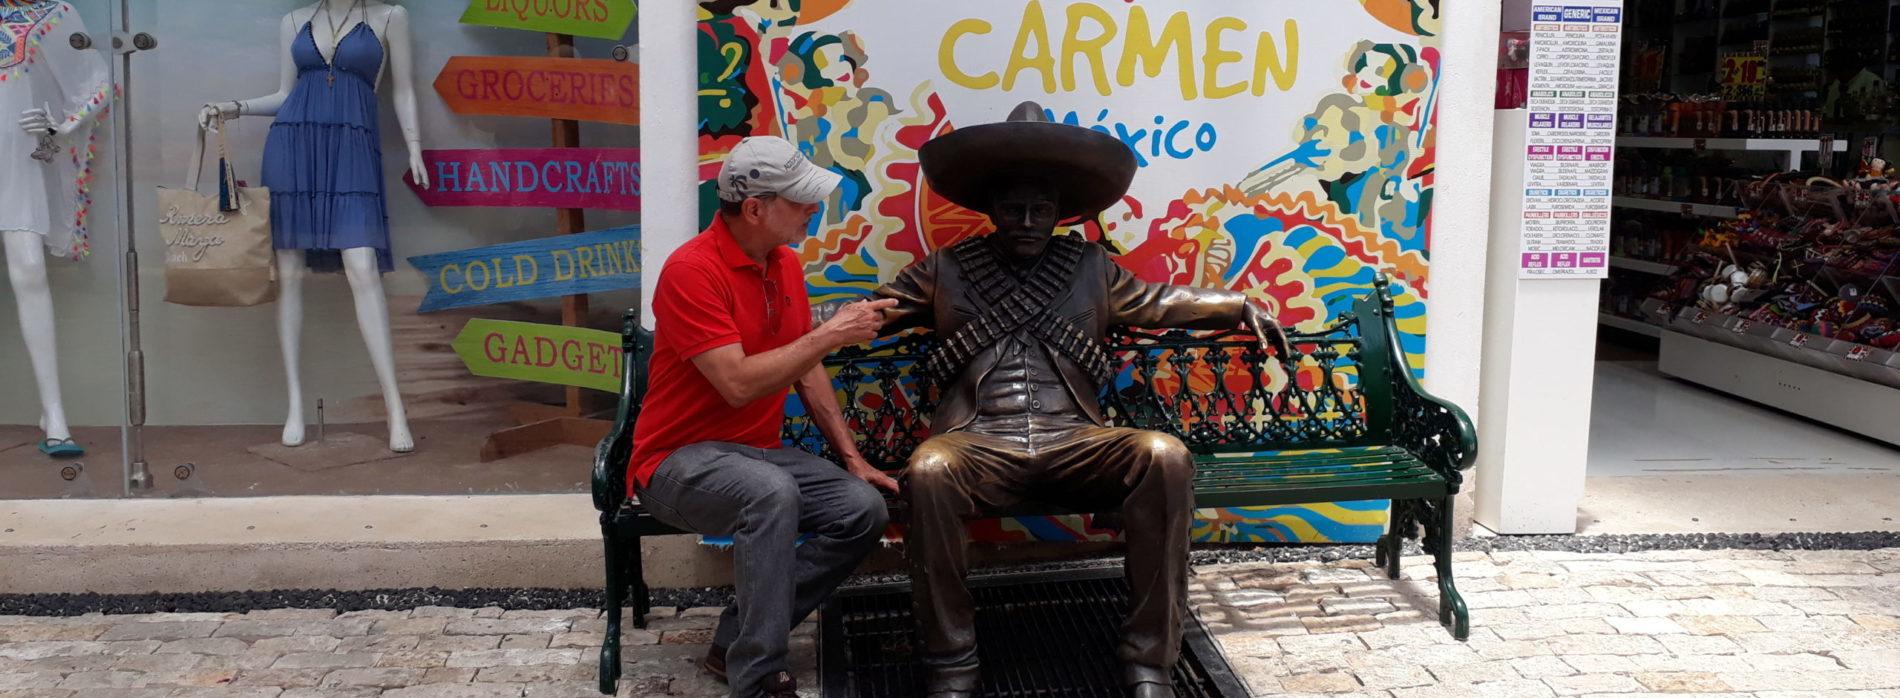 Carmen 3